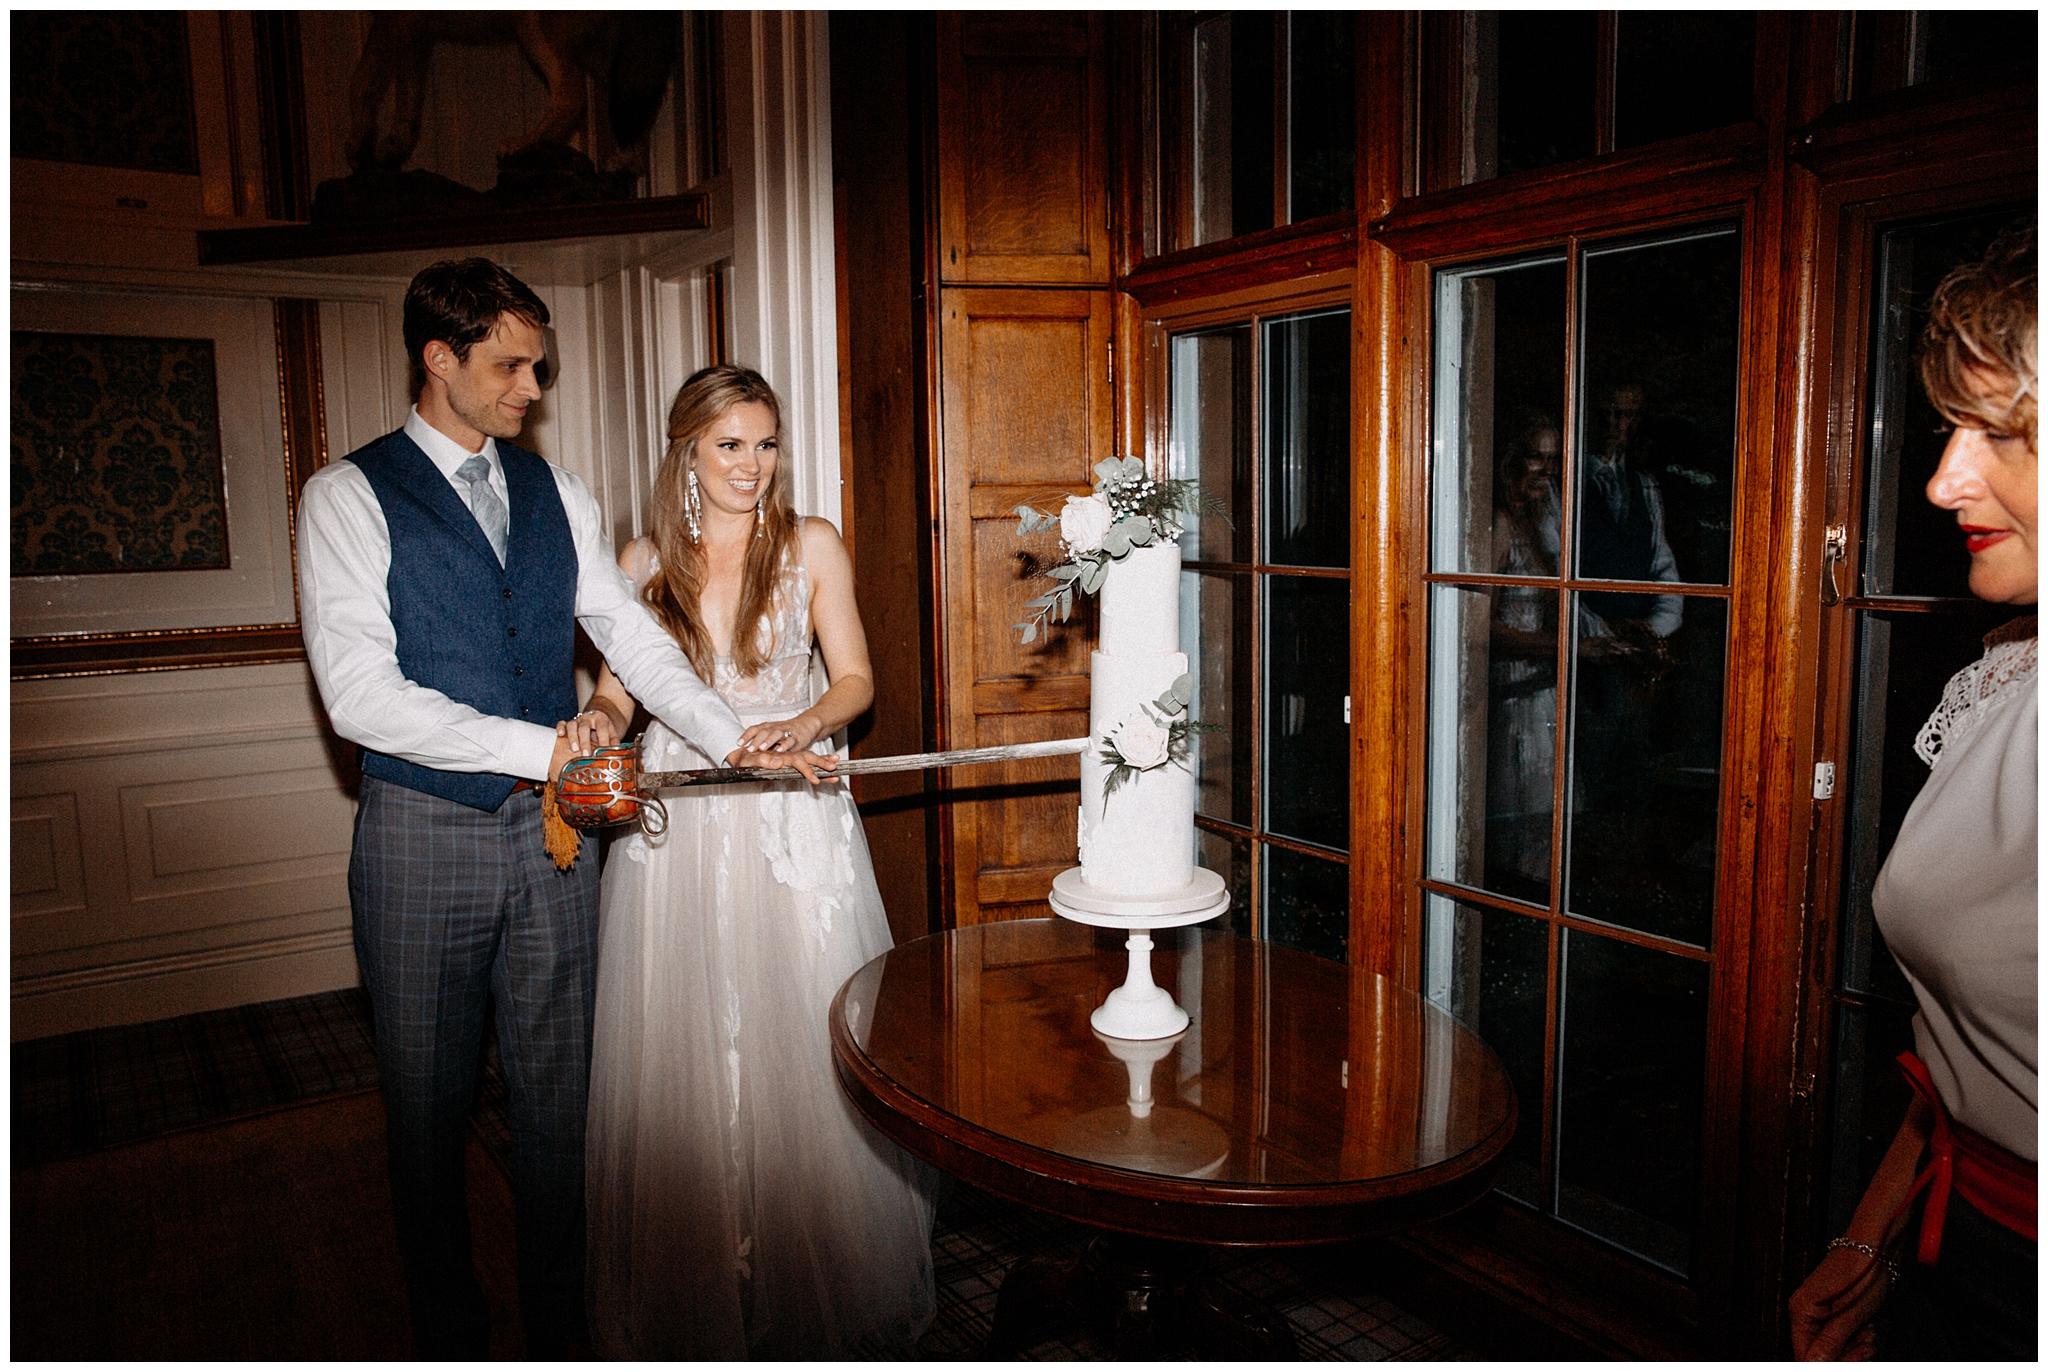 austin-texas-scottish-wedding-bride-groom22024.JPG